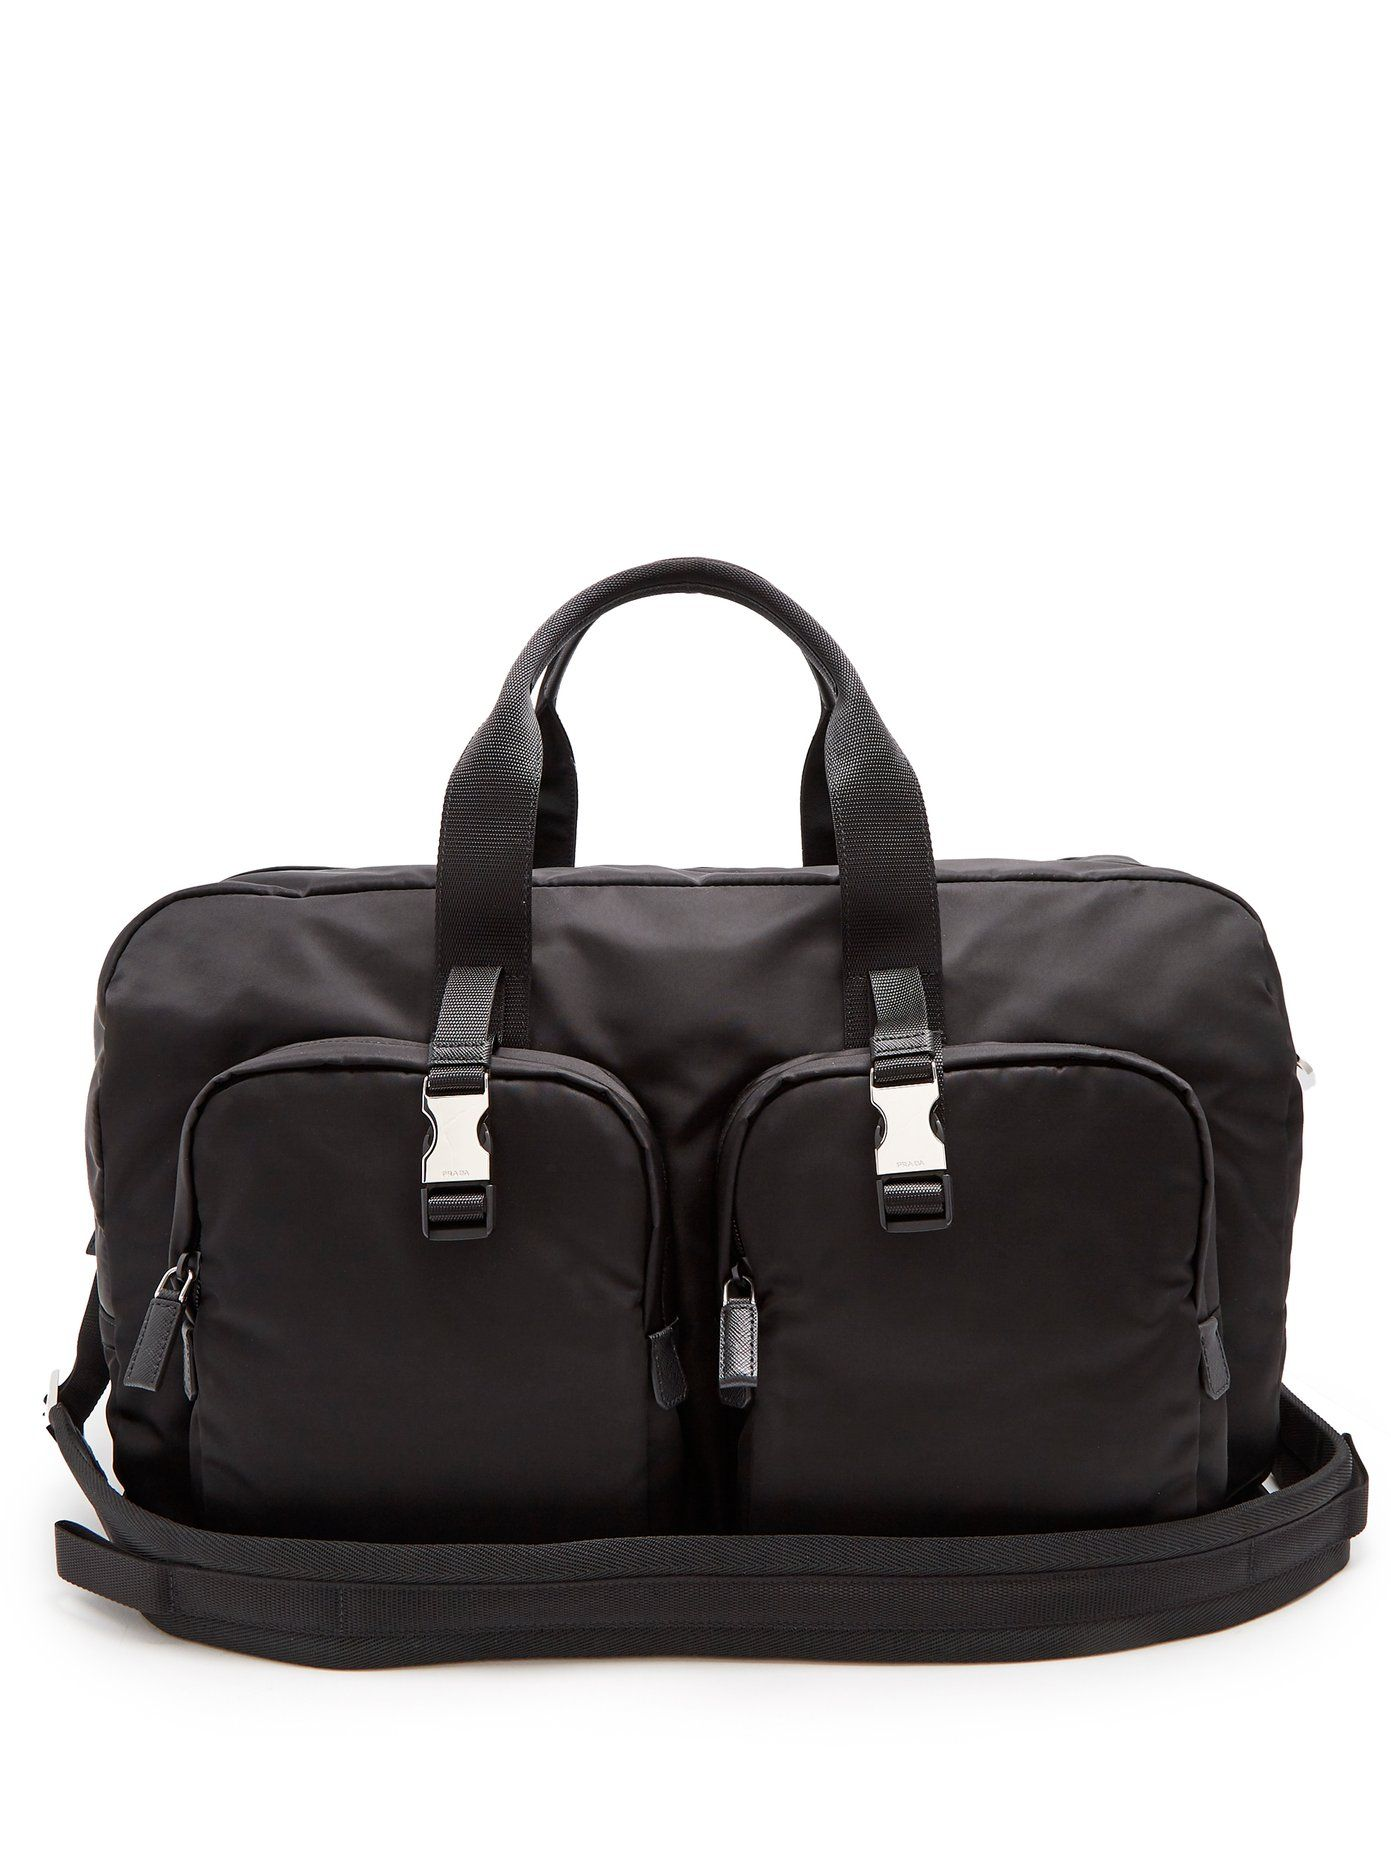 361f86138eca Prada Double pocket nylon holdall | Bags | Bags, Prada, Pocket